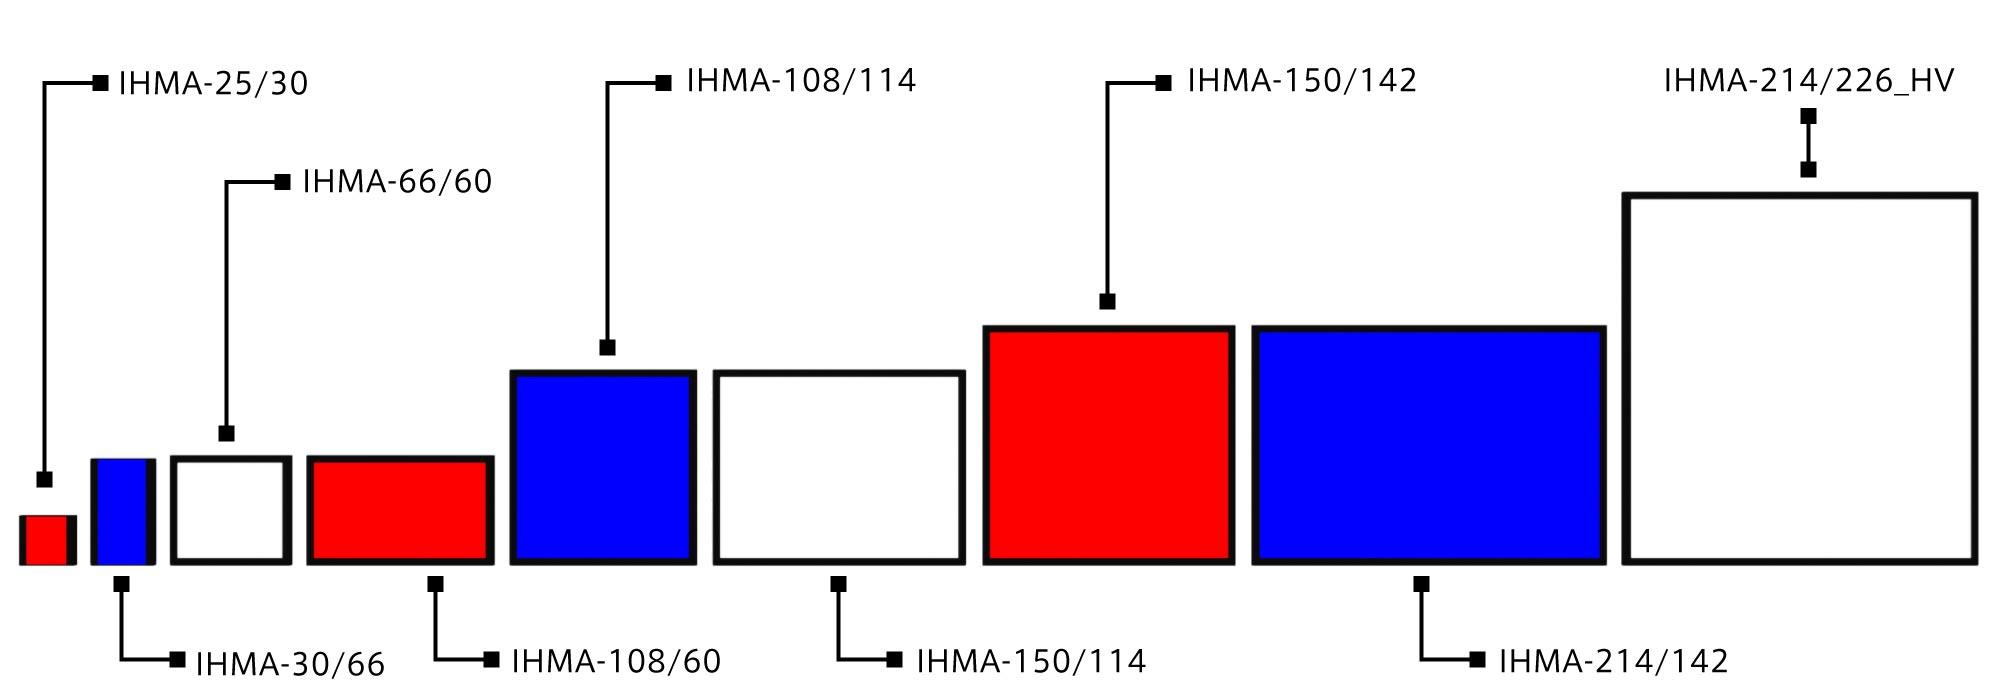 IHMA series